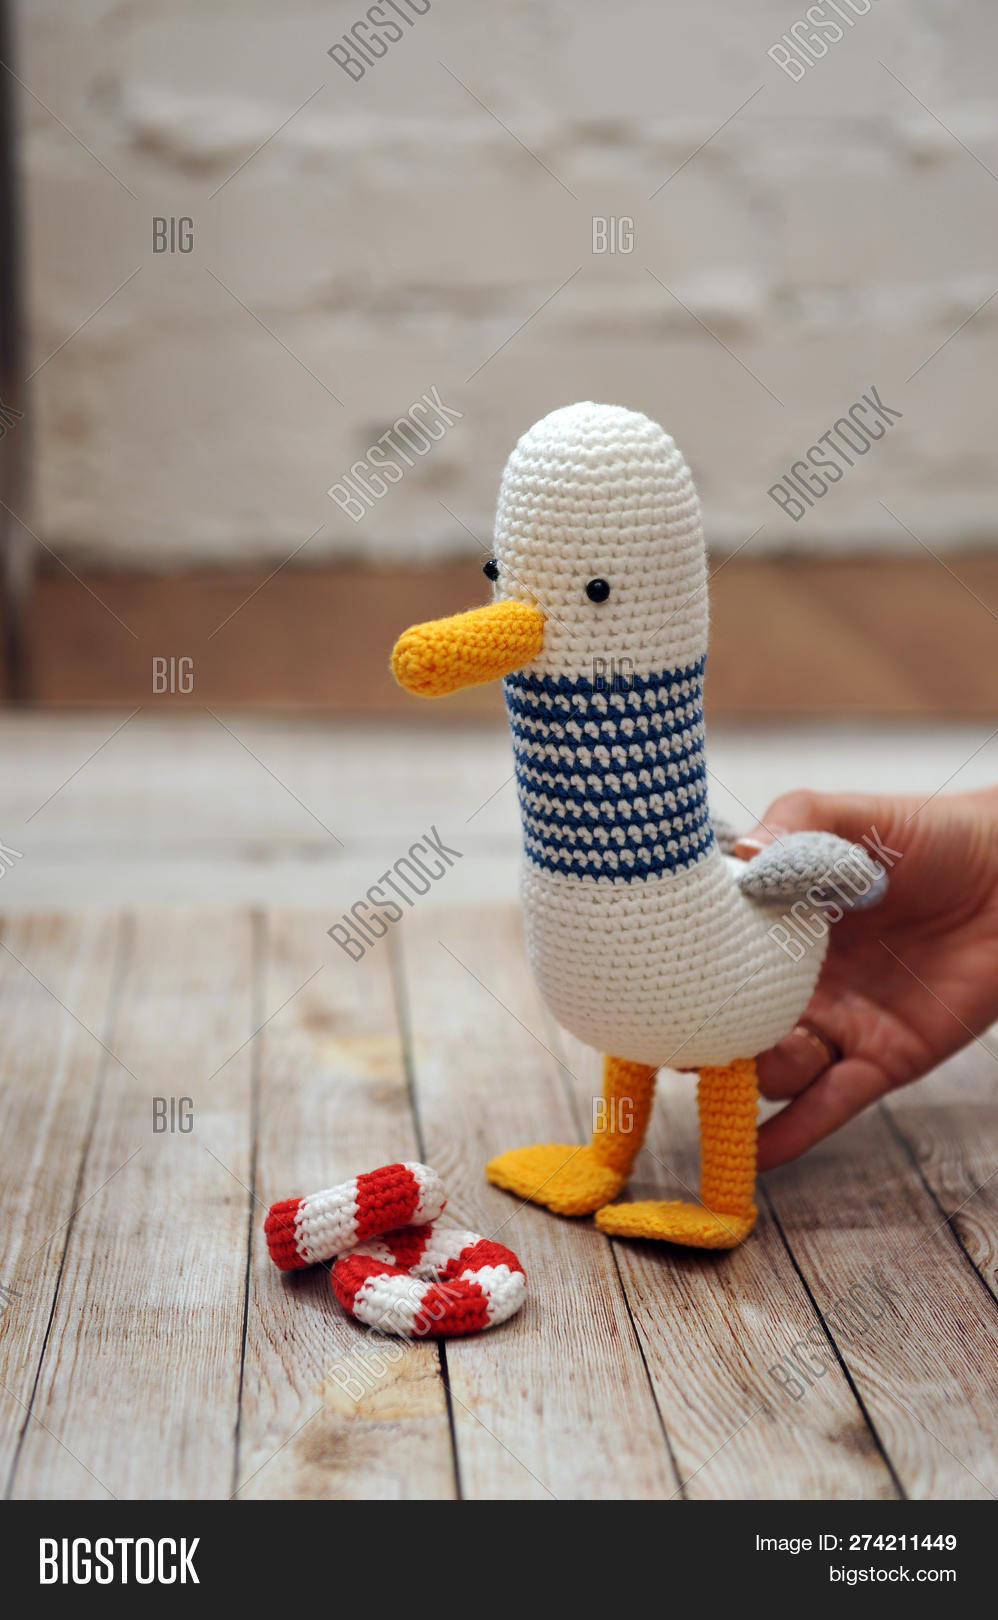 Amigurumi Toy Seagull Image Photo Free Trial Bigstock